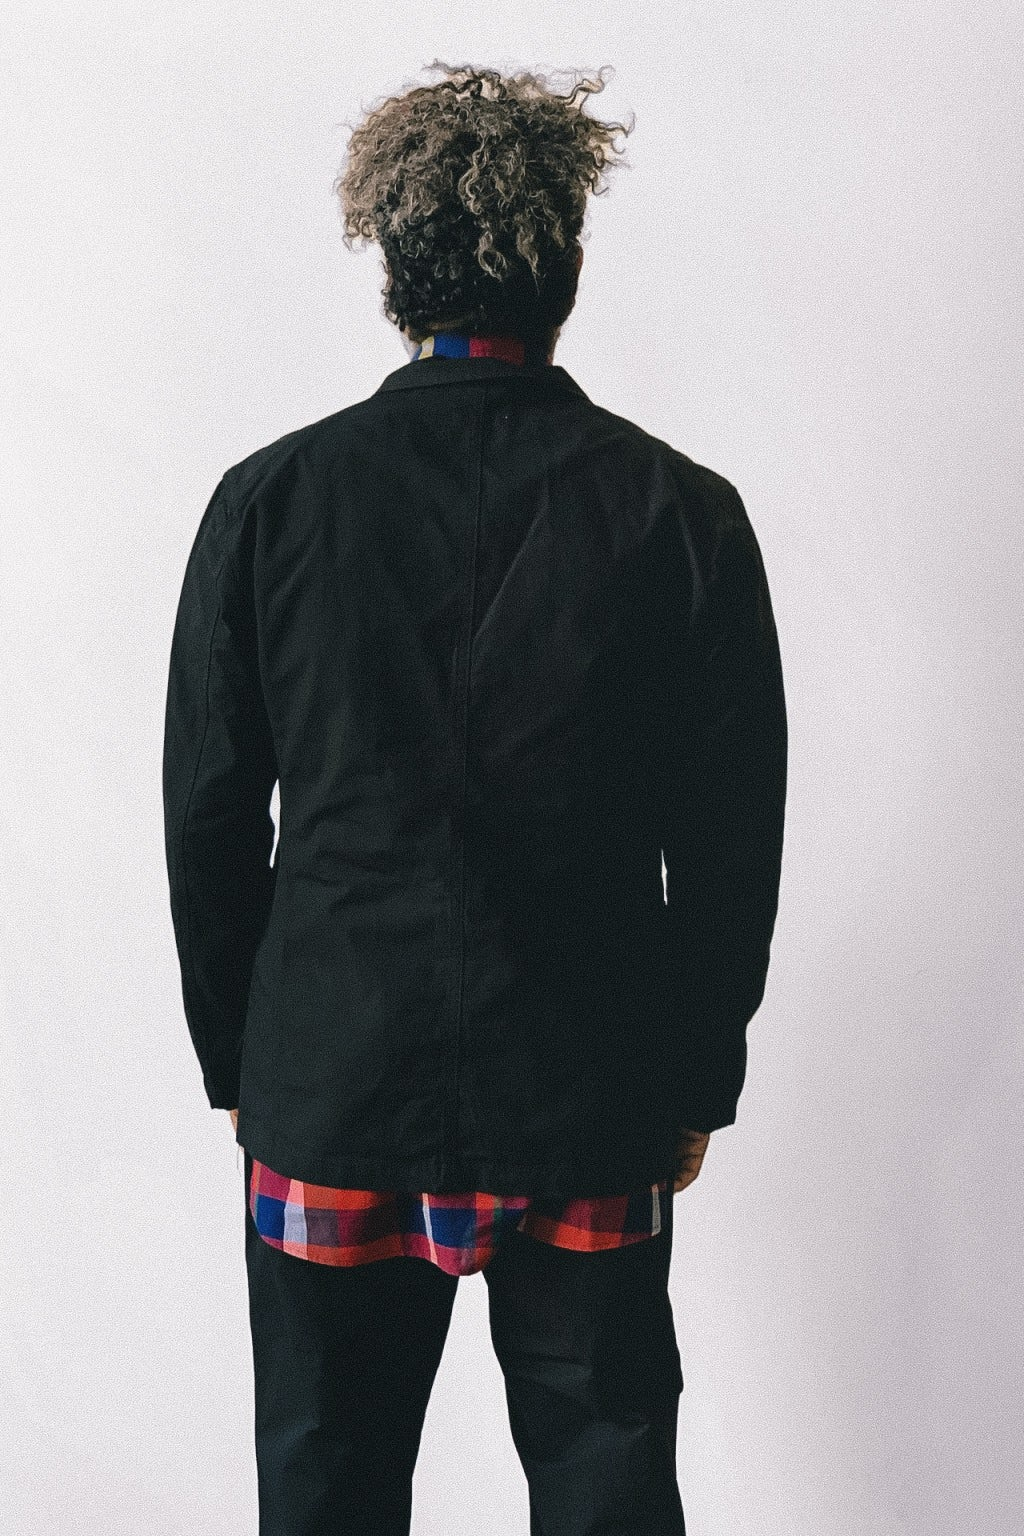 Engineered Garments Fatigue Pants Black Cotton Ripstop